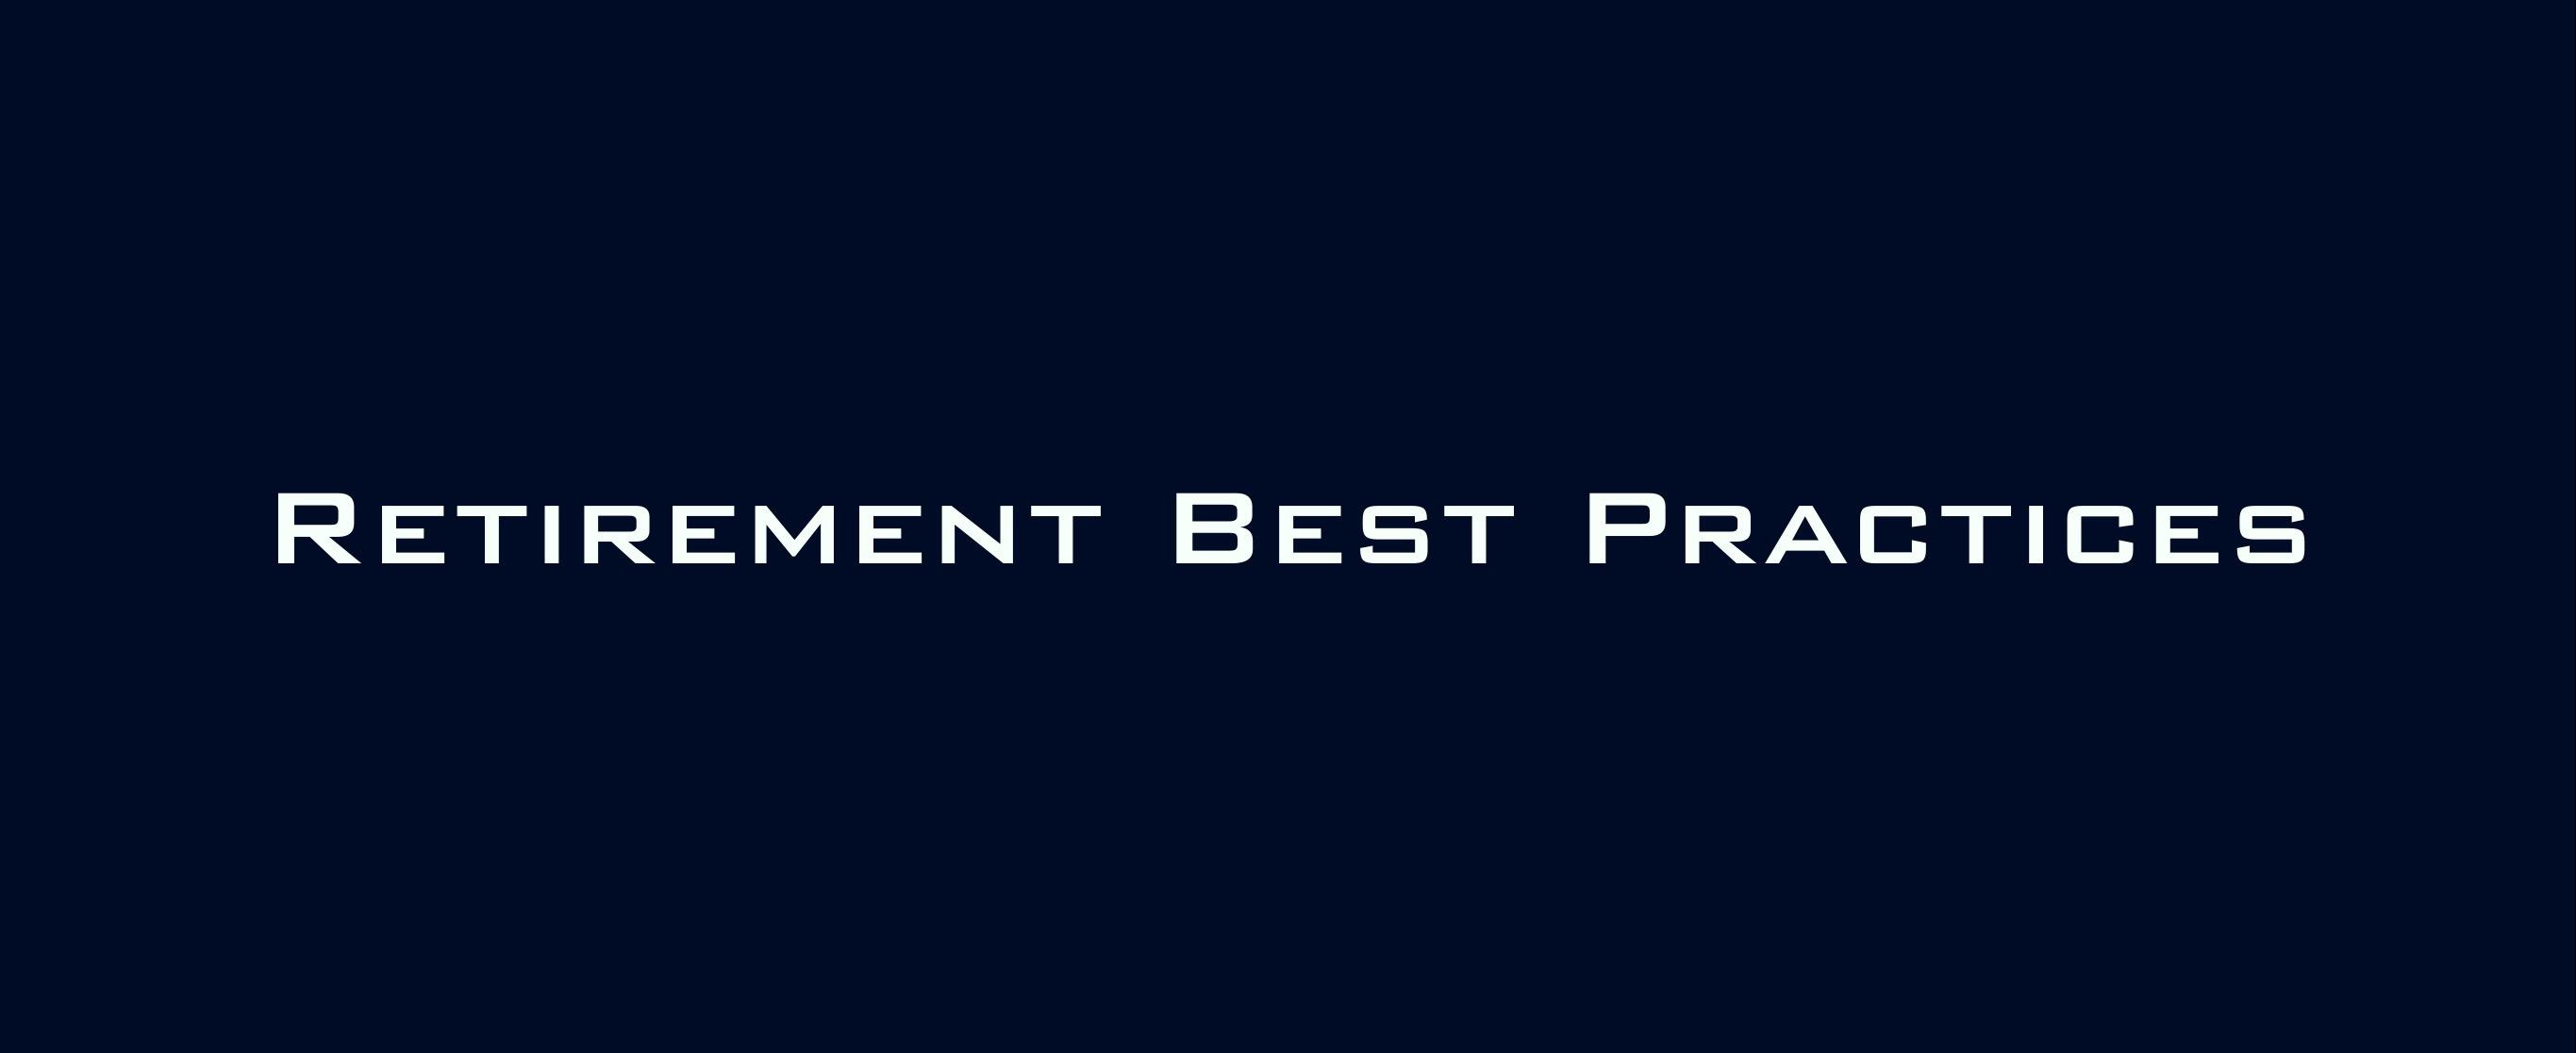 9 Retirement Best Practices